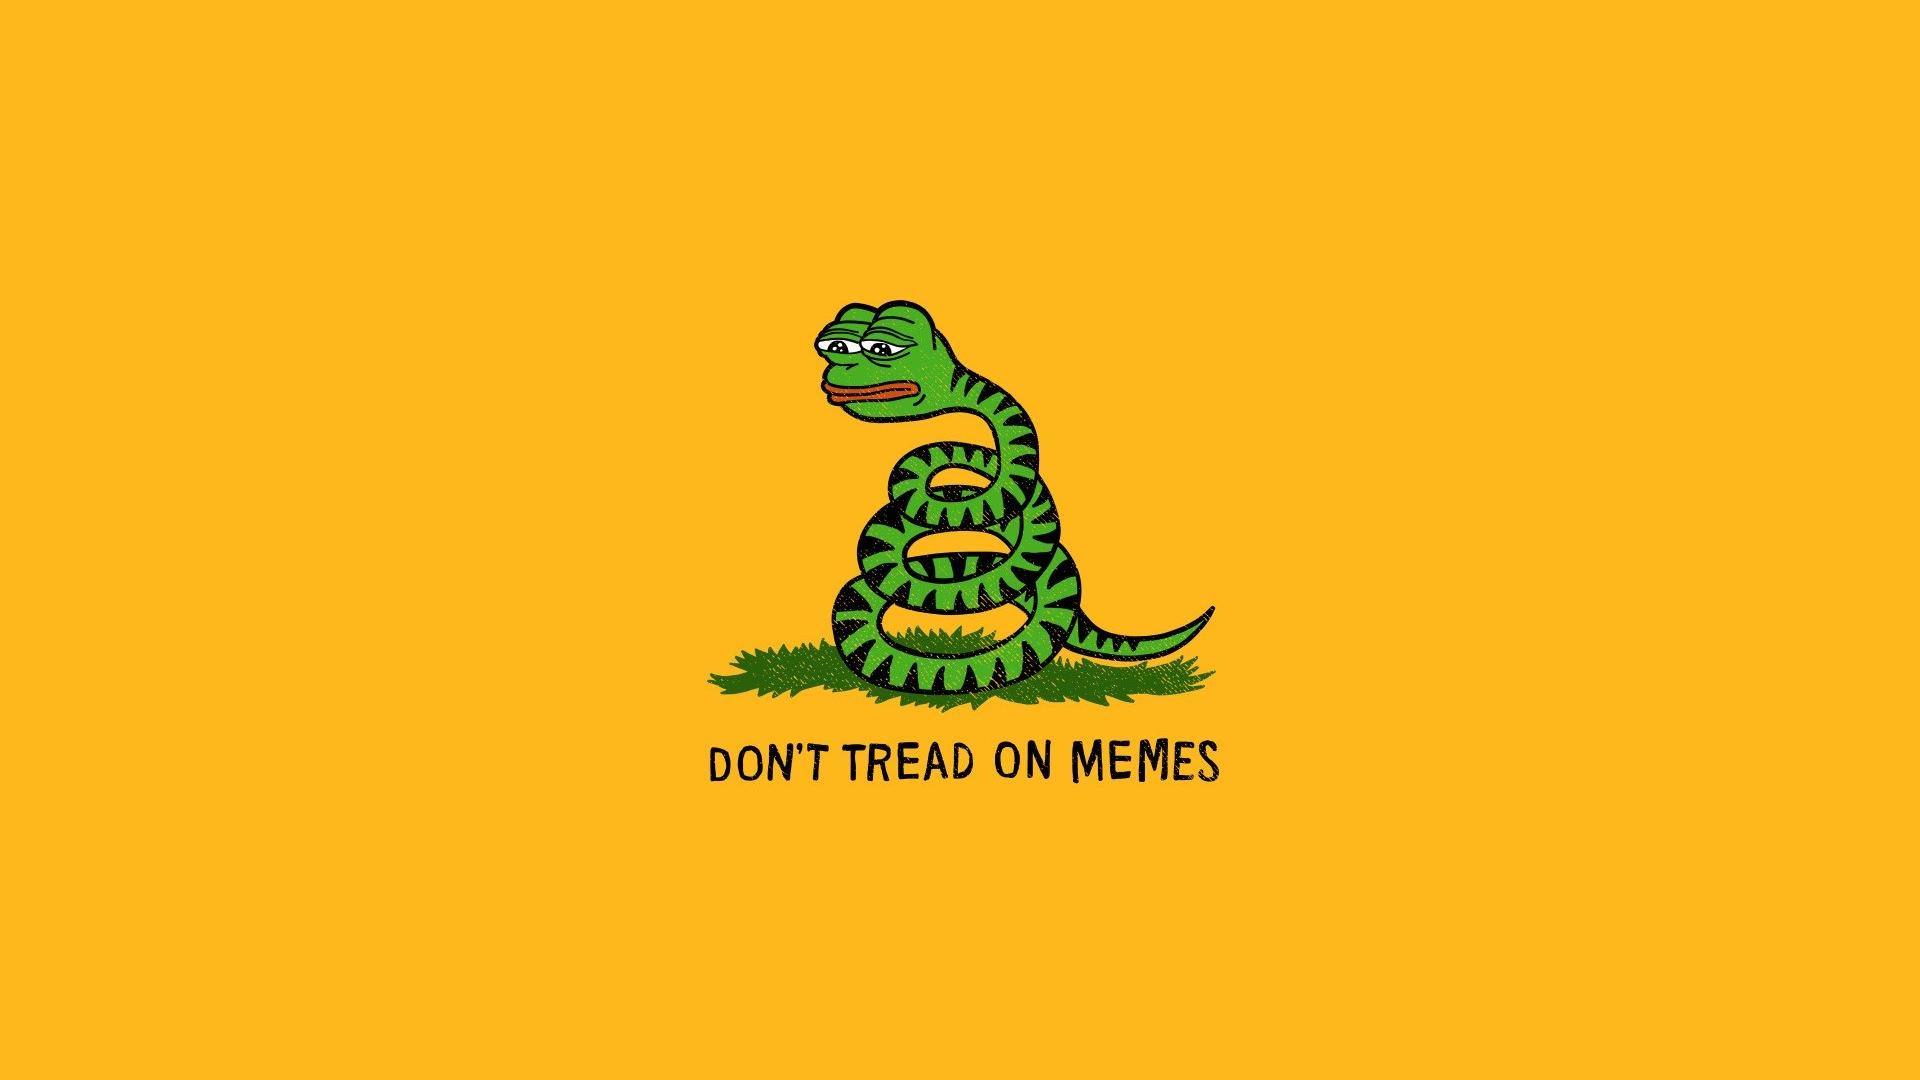 Pepe Meme Gadsden Flag Simple Background Snake Minimalism Memes Wallpaper Resolution 1920x1080 Id 603465 Wallha Com